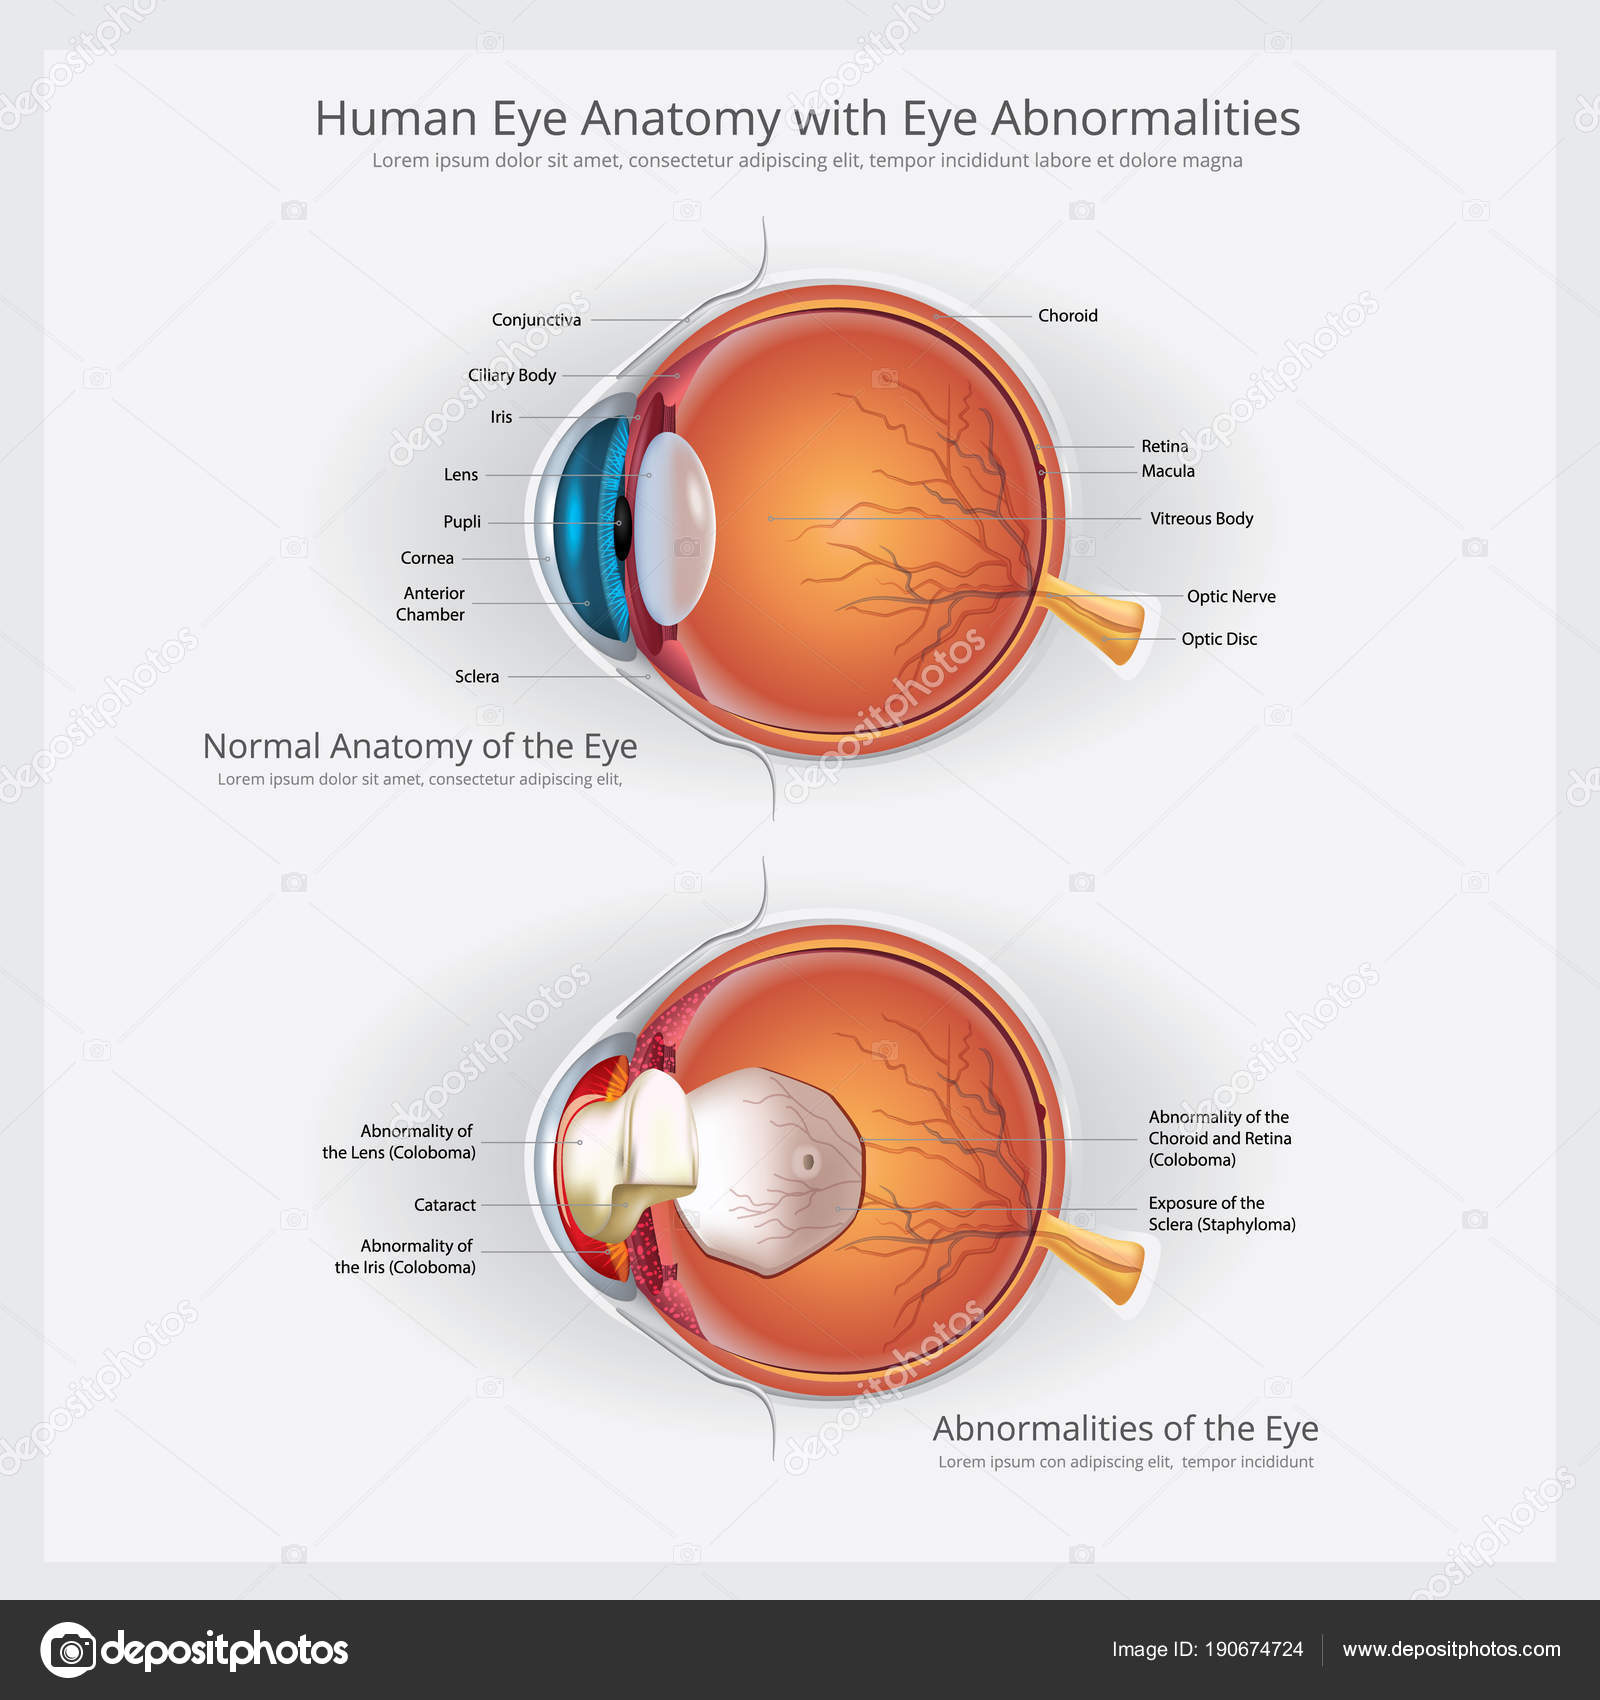 Anatomía Ojo Con Ojo Anormalidades Vector Ilustración — Vector de ...